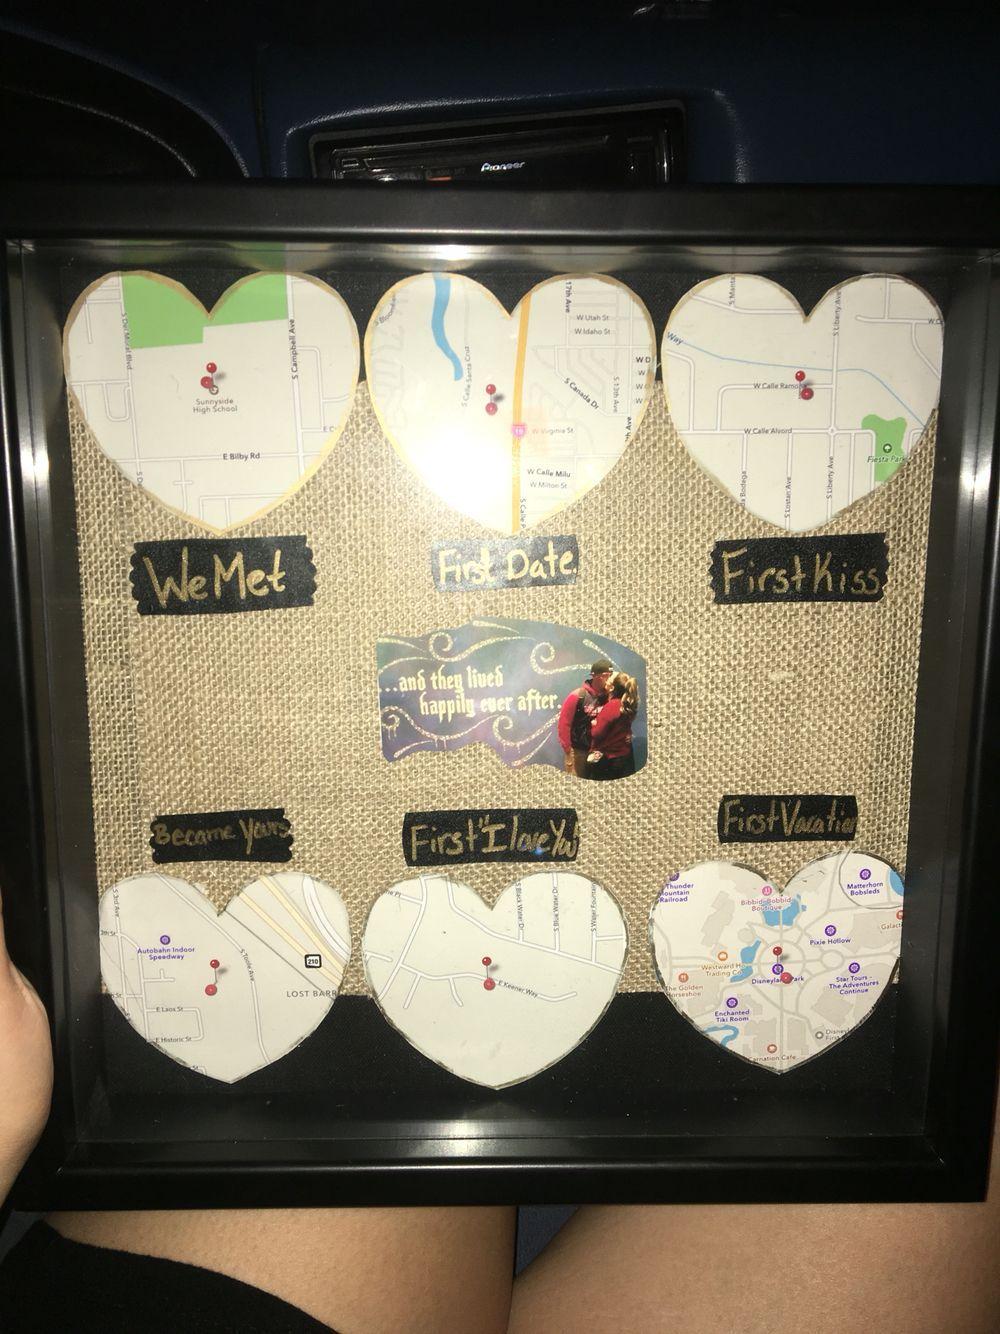 Anniversary present I made for my boyfriend ☺️ #homemadeboyfriendgifts